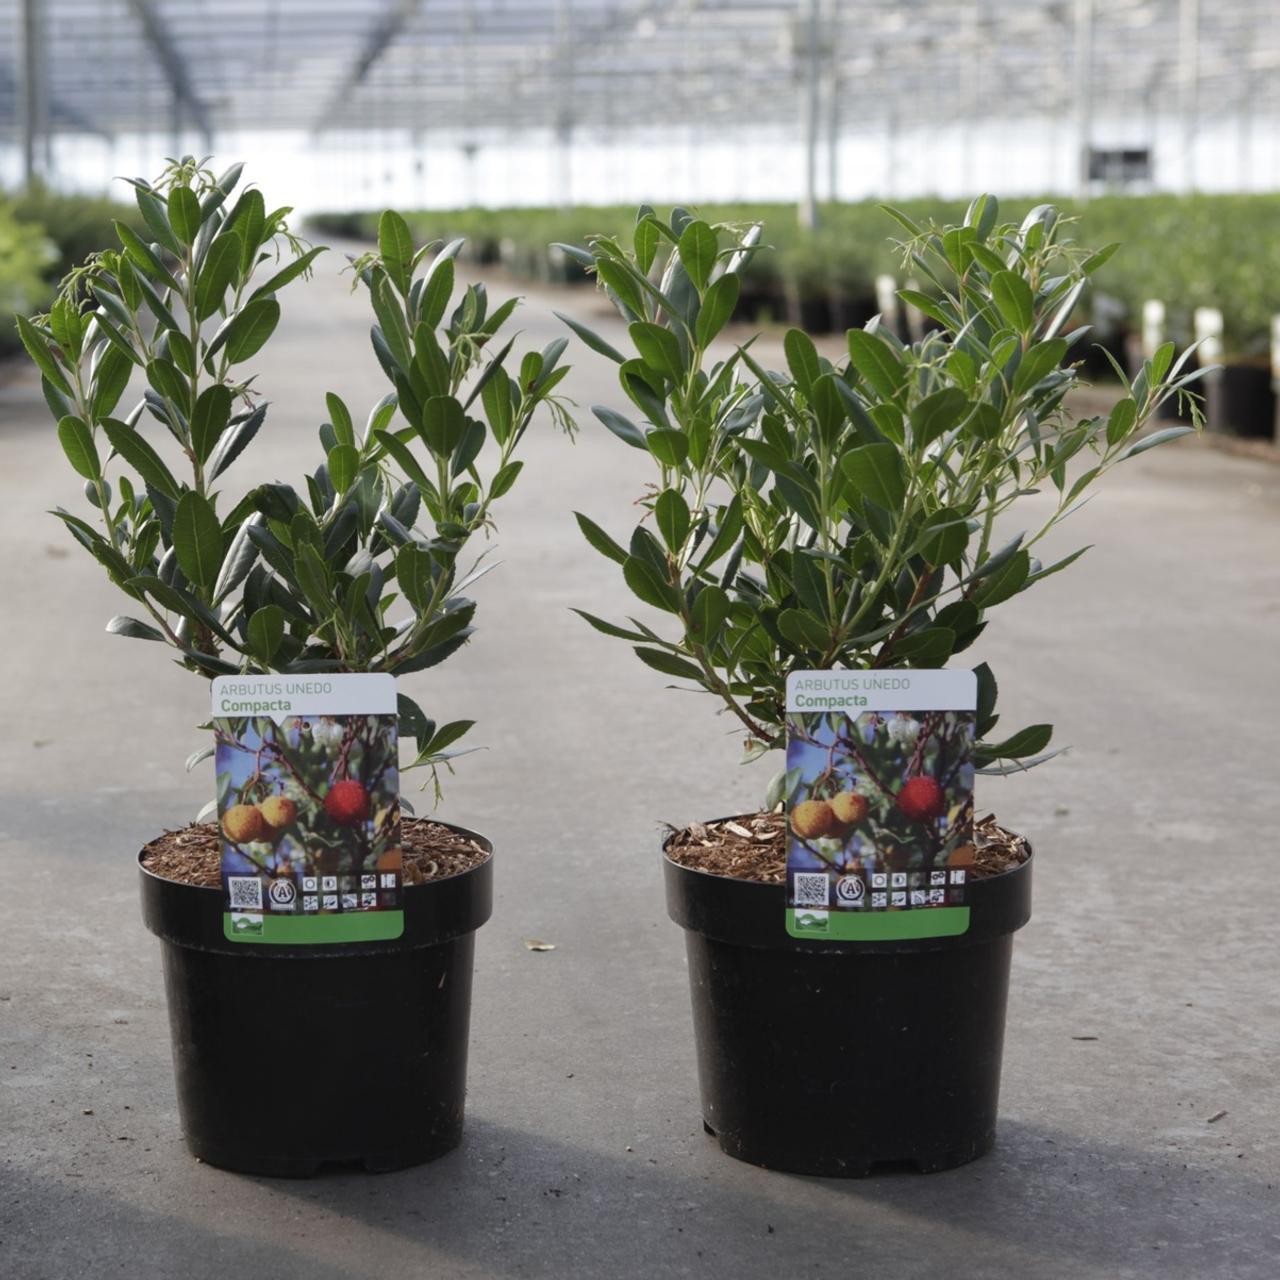 Arbutus unedo 'Compacta' plant